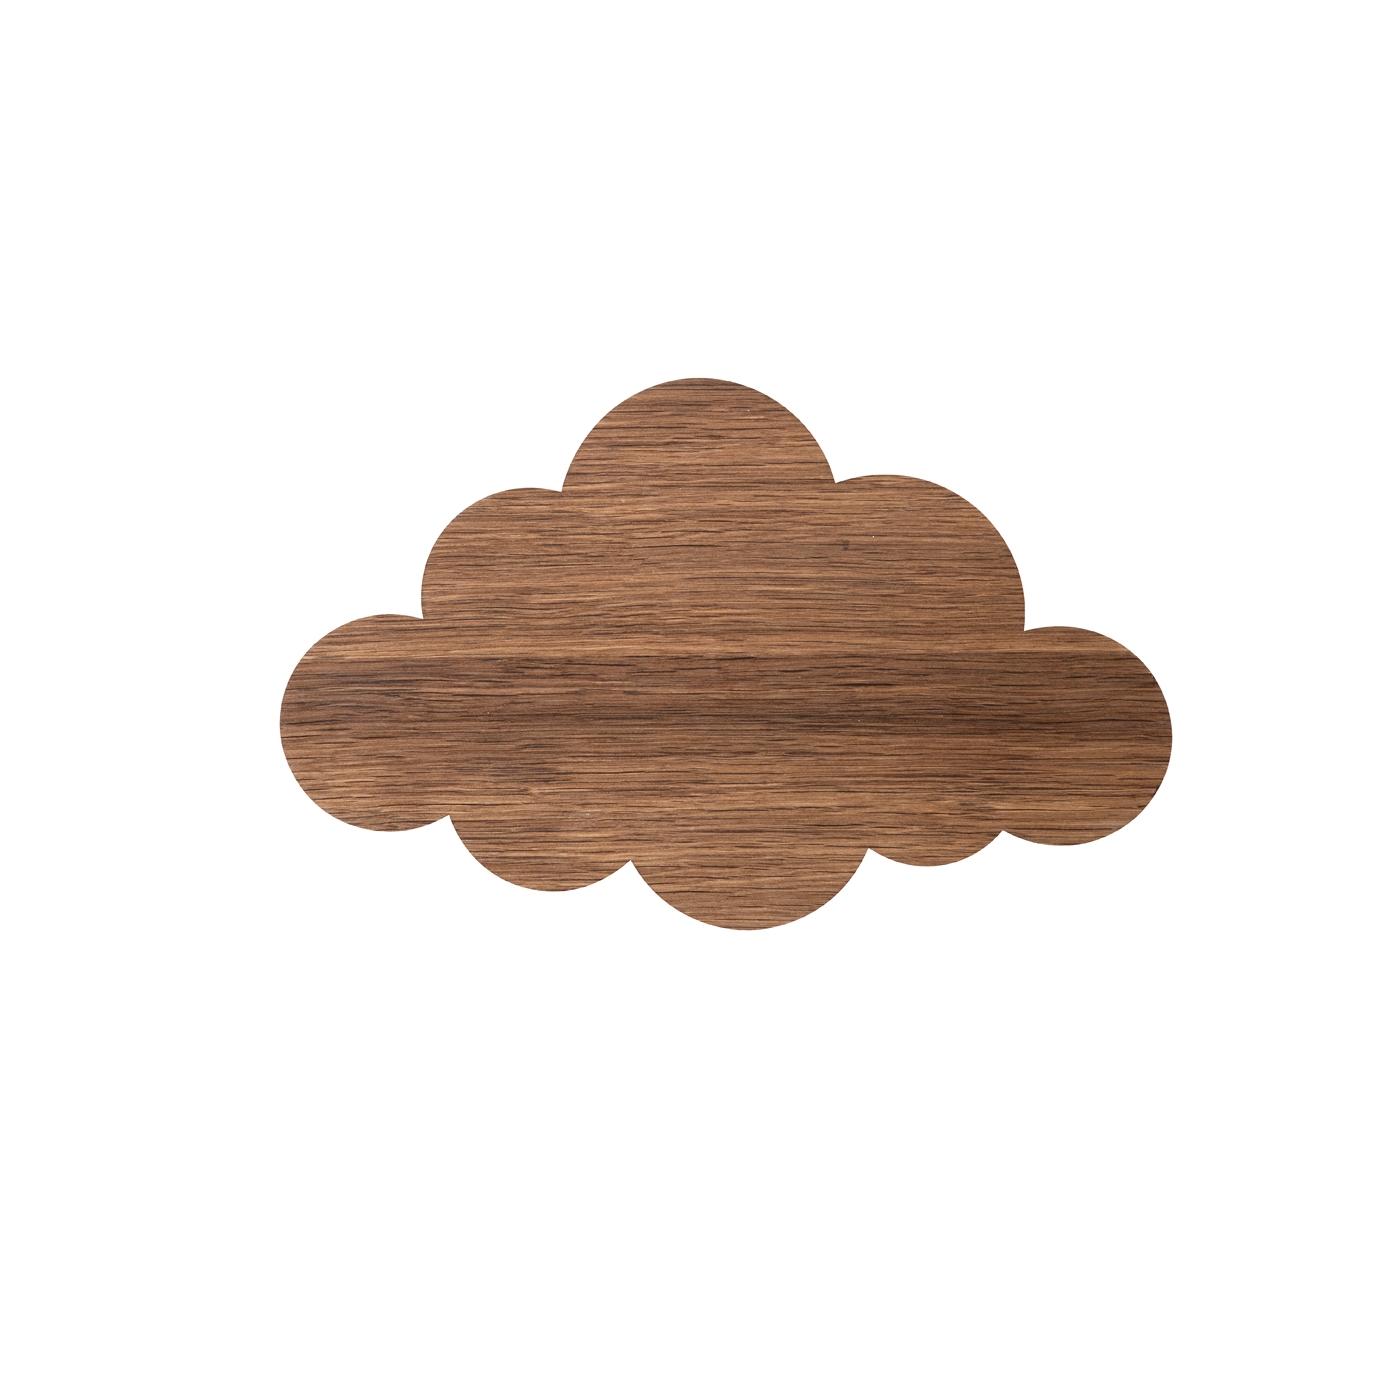 Barnlampa Cloud smoked oak, Ferm Living